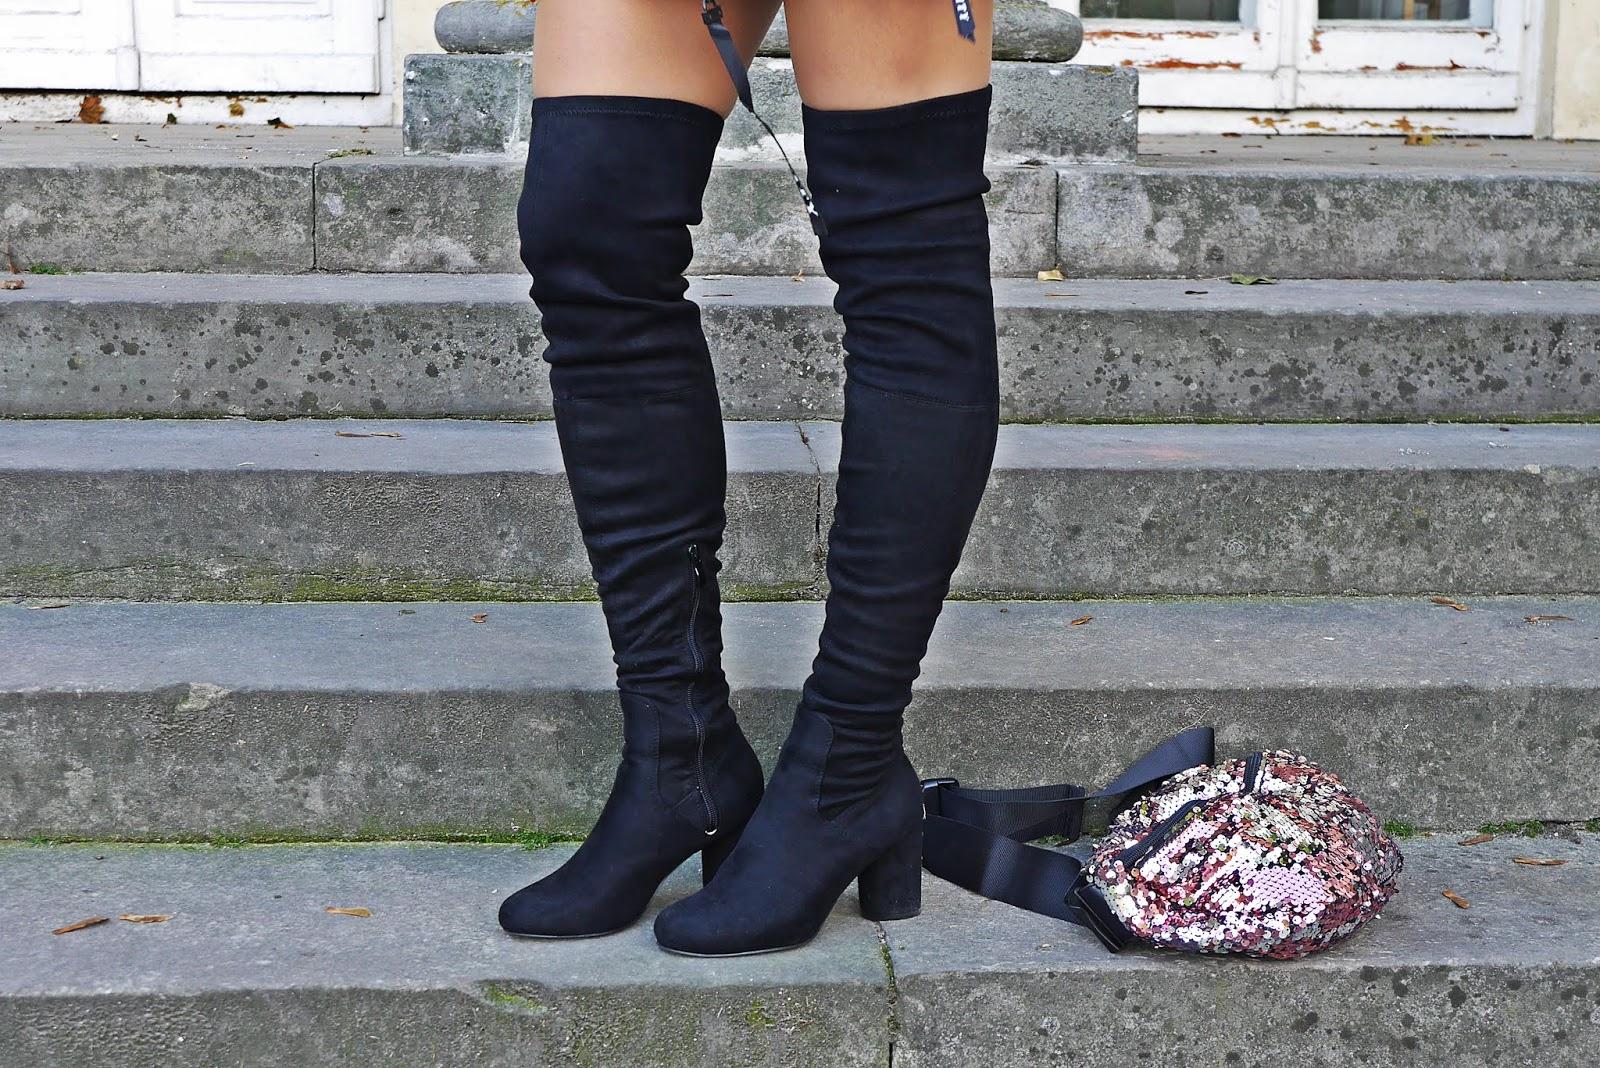 Kozaki za kolano renee karyn blog modowy